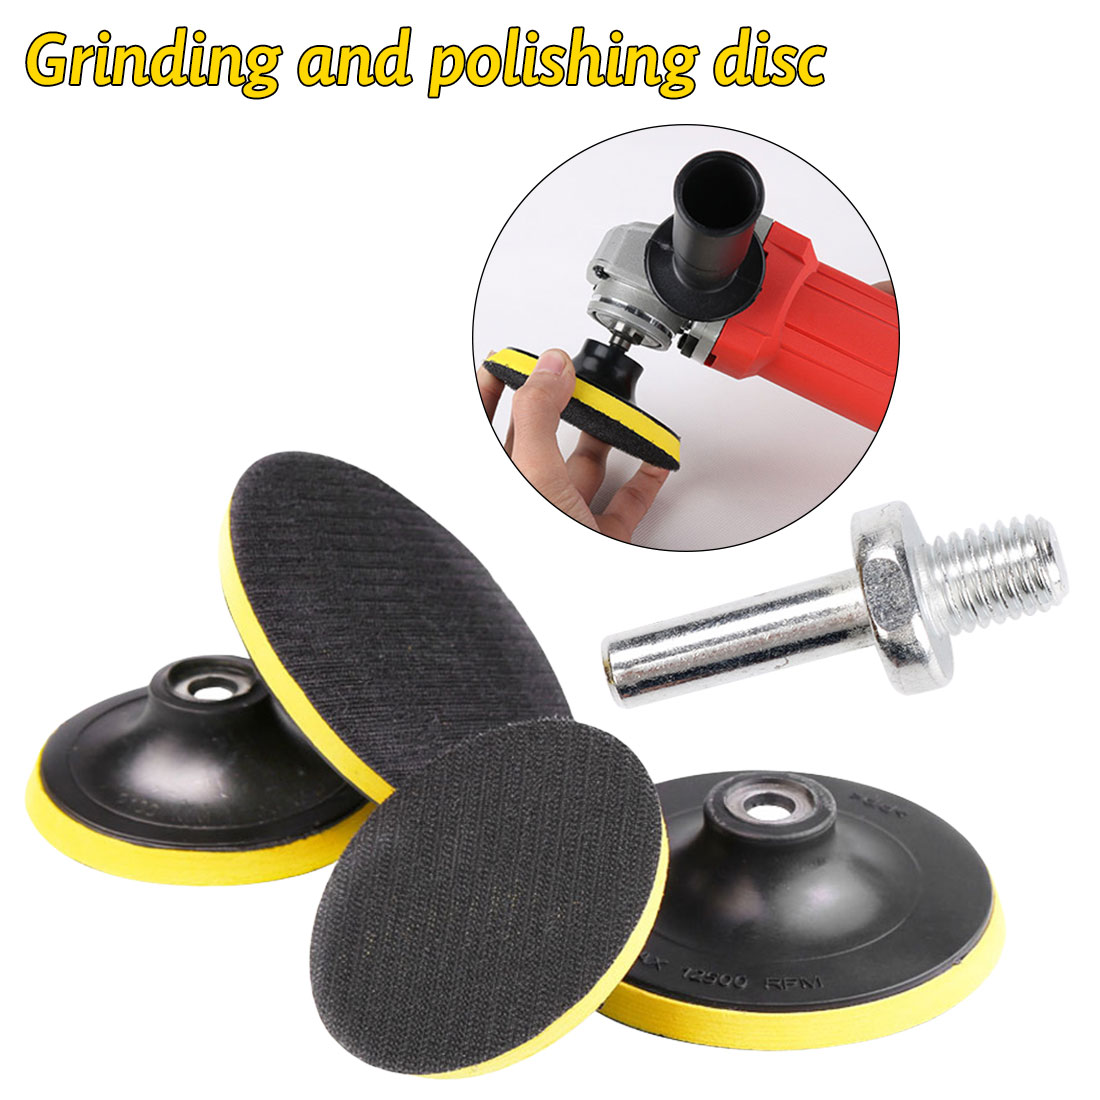 Grinding And Polishing Disc Self-adhesive Sandpaper Disc Grinding Disc Sponge Polishing Electric Drill Polishing Disc